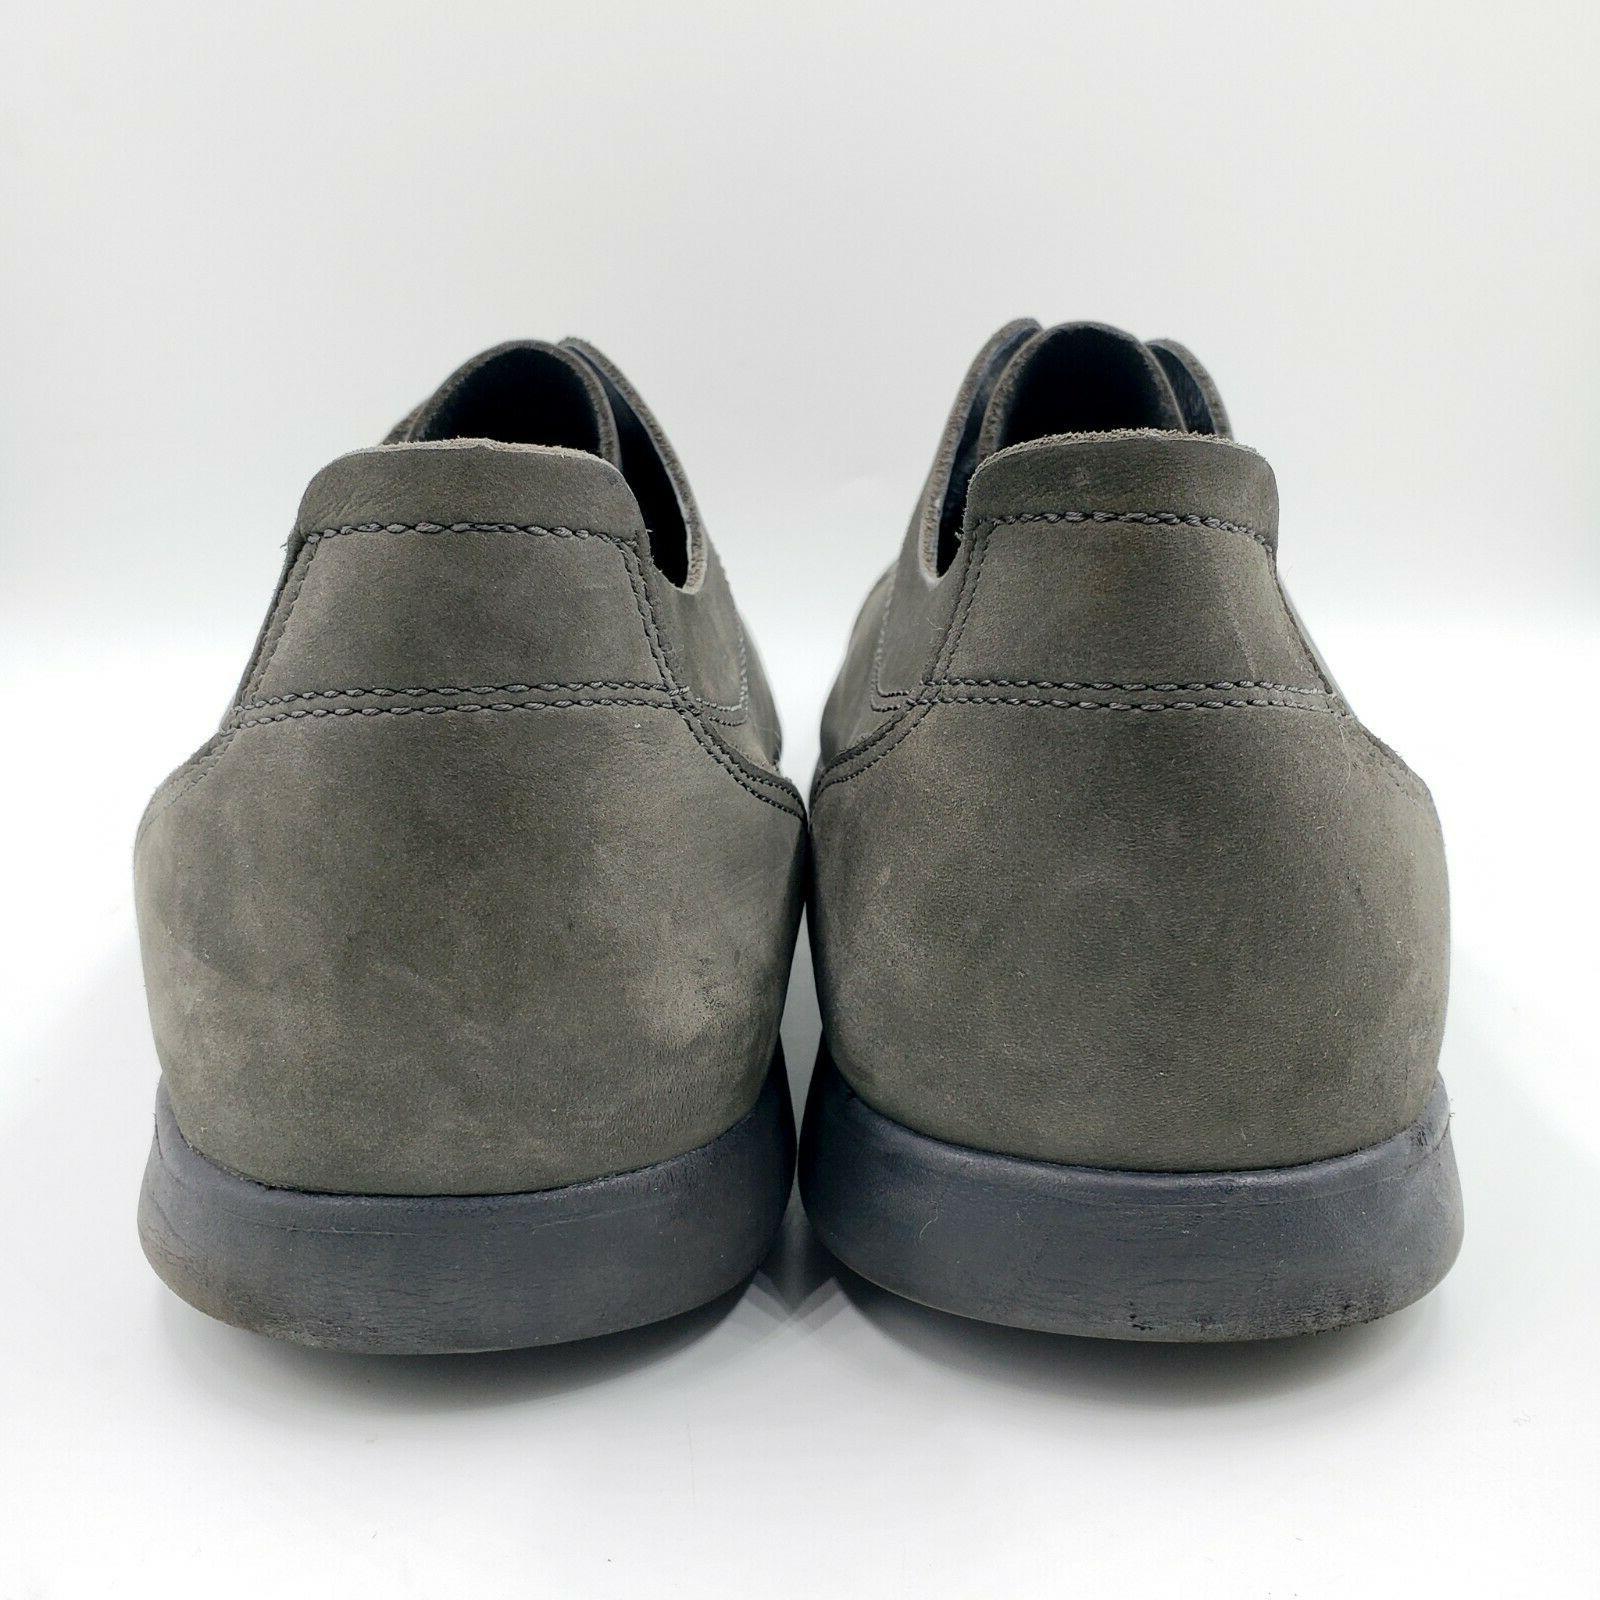 Crocs Leather